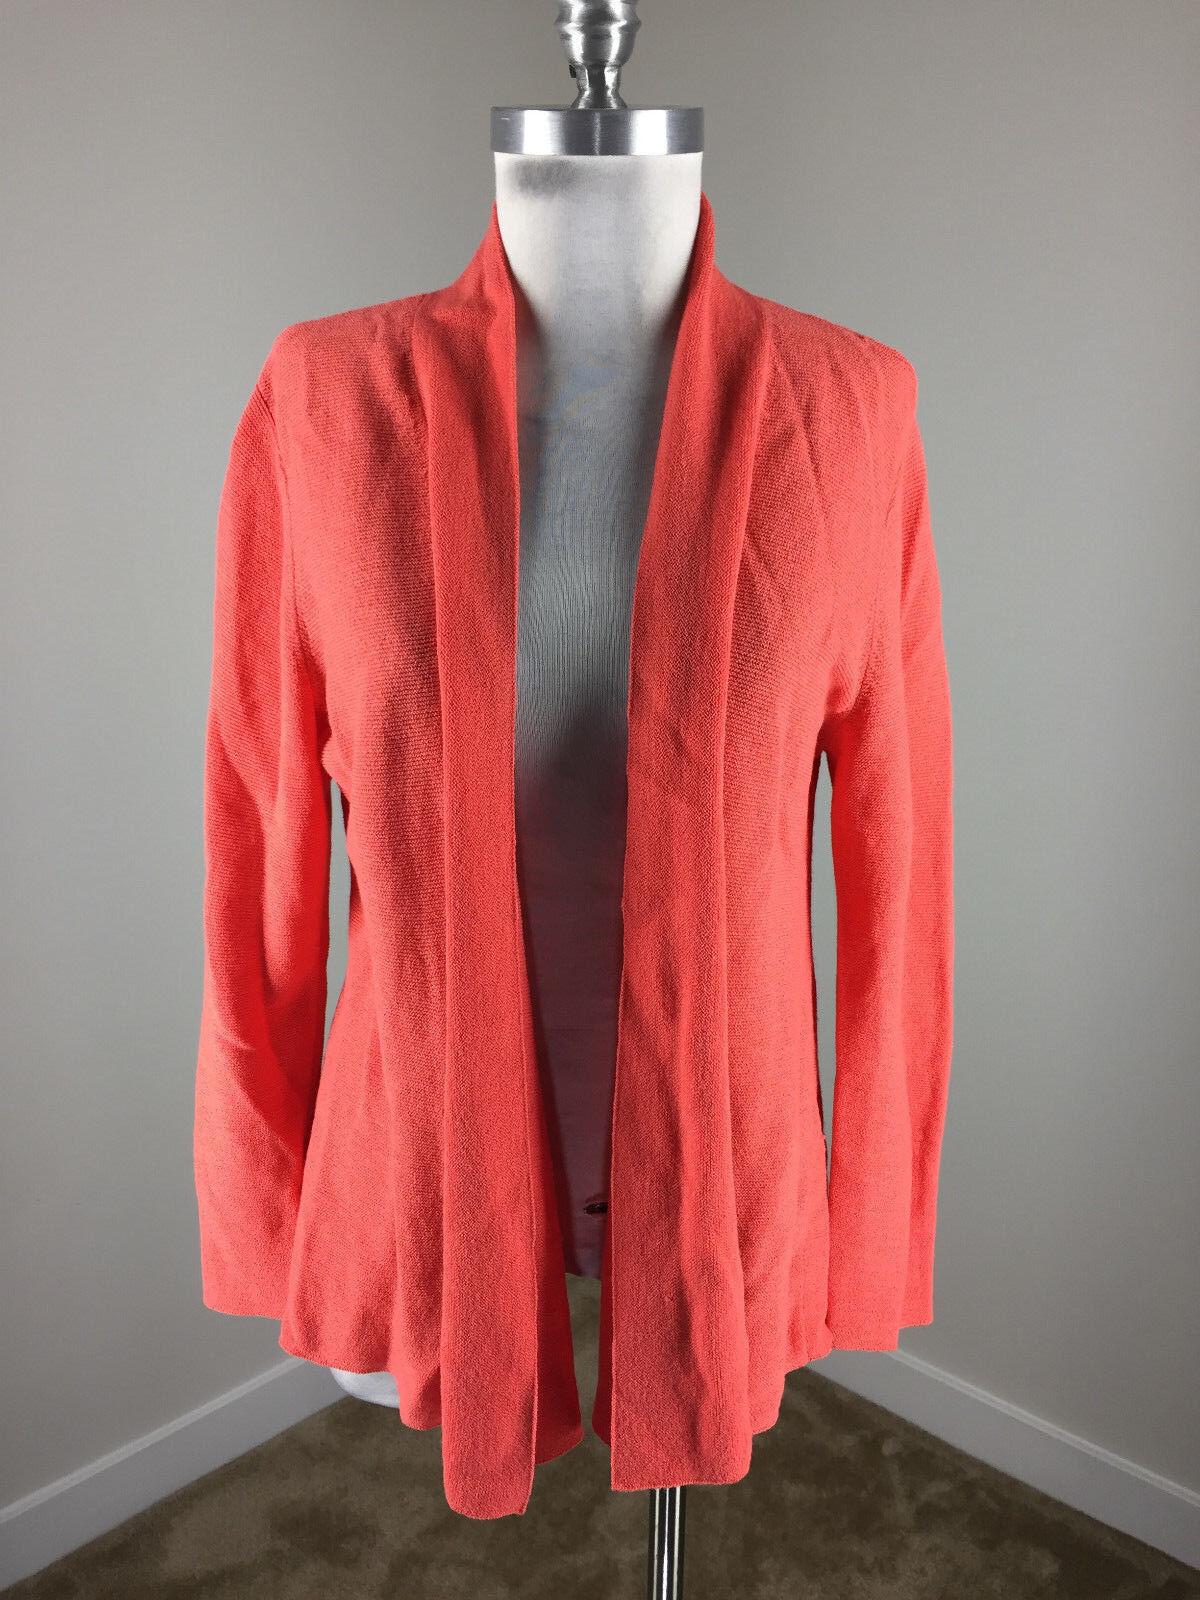 Eileen Fisher L Peach Coral Open drape Cardigan sweater 100% wool